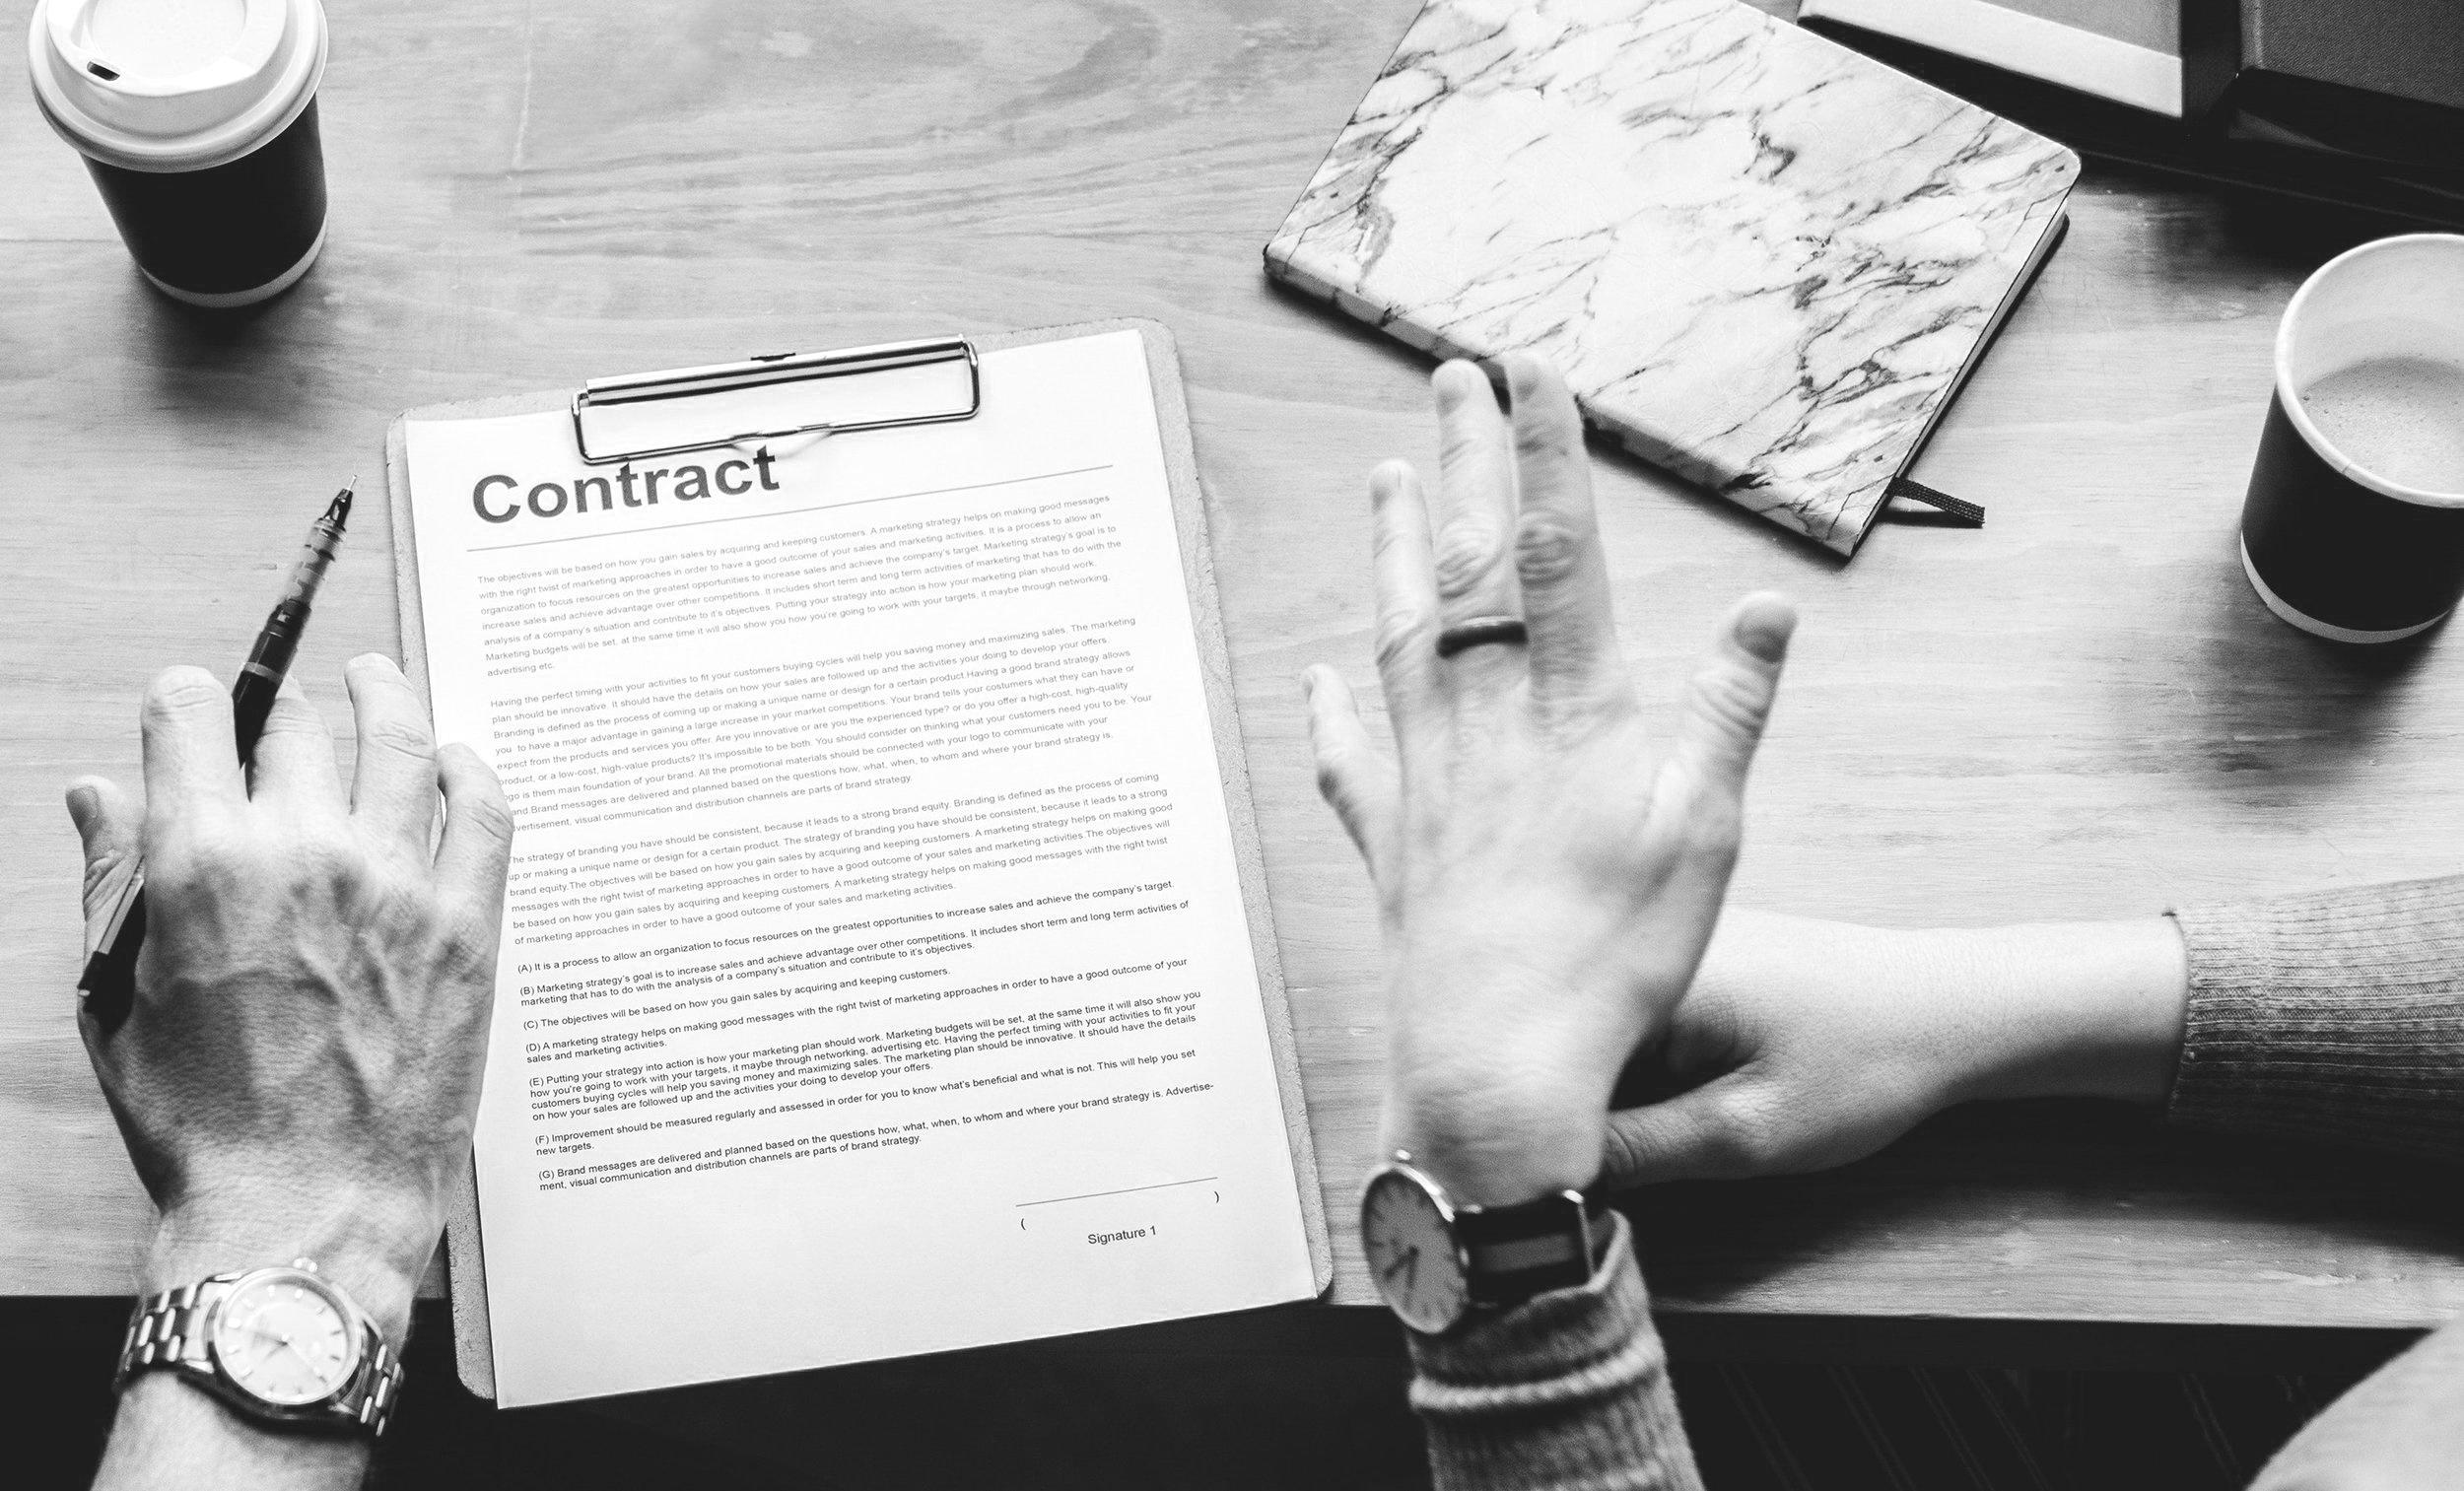 agreement-coffee-content-1076815.jpg